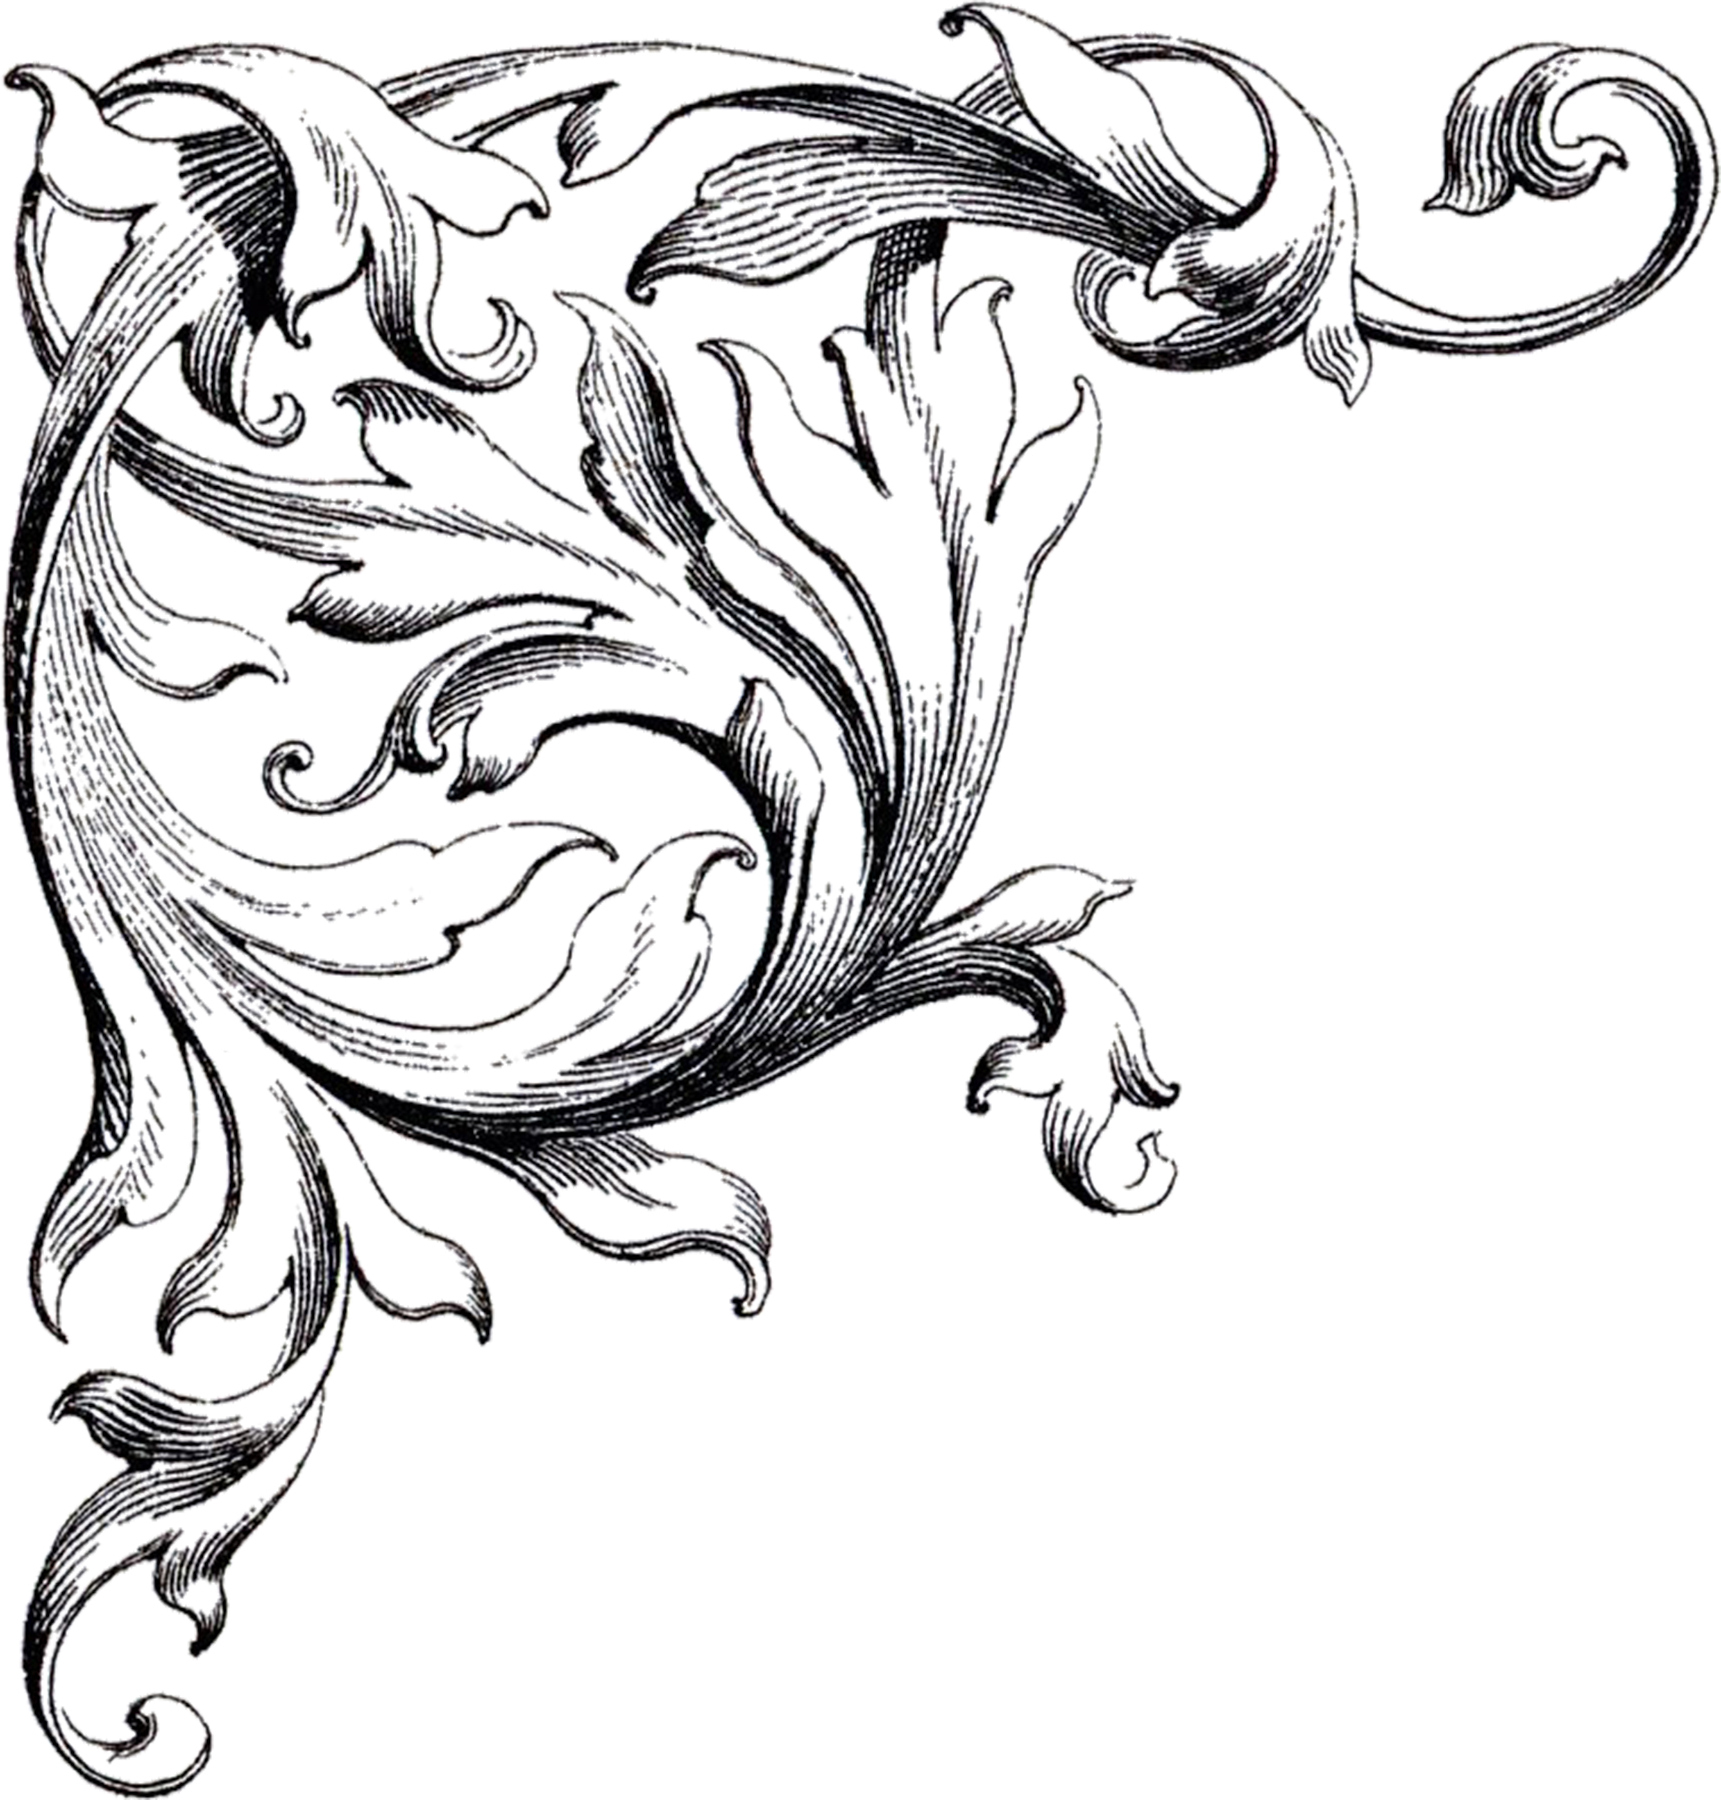 Wedding scroll clipart free vector stock Free Wedding Clip Art Scrolls - The Graphics Fairy vector stock